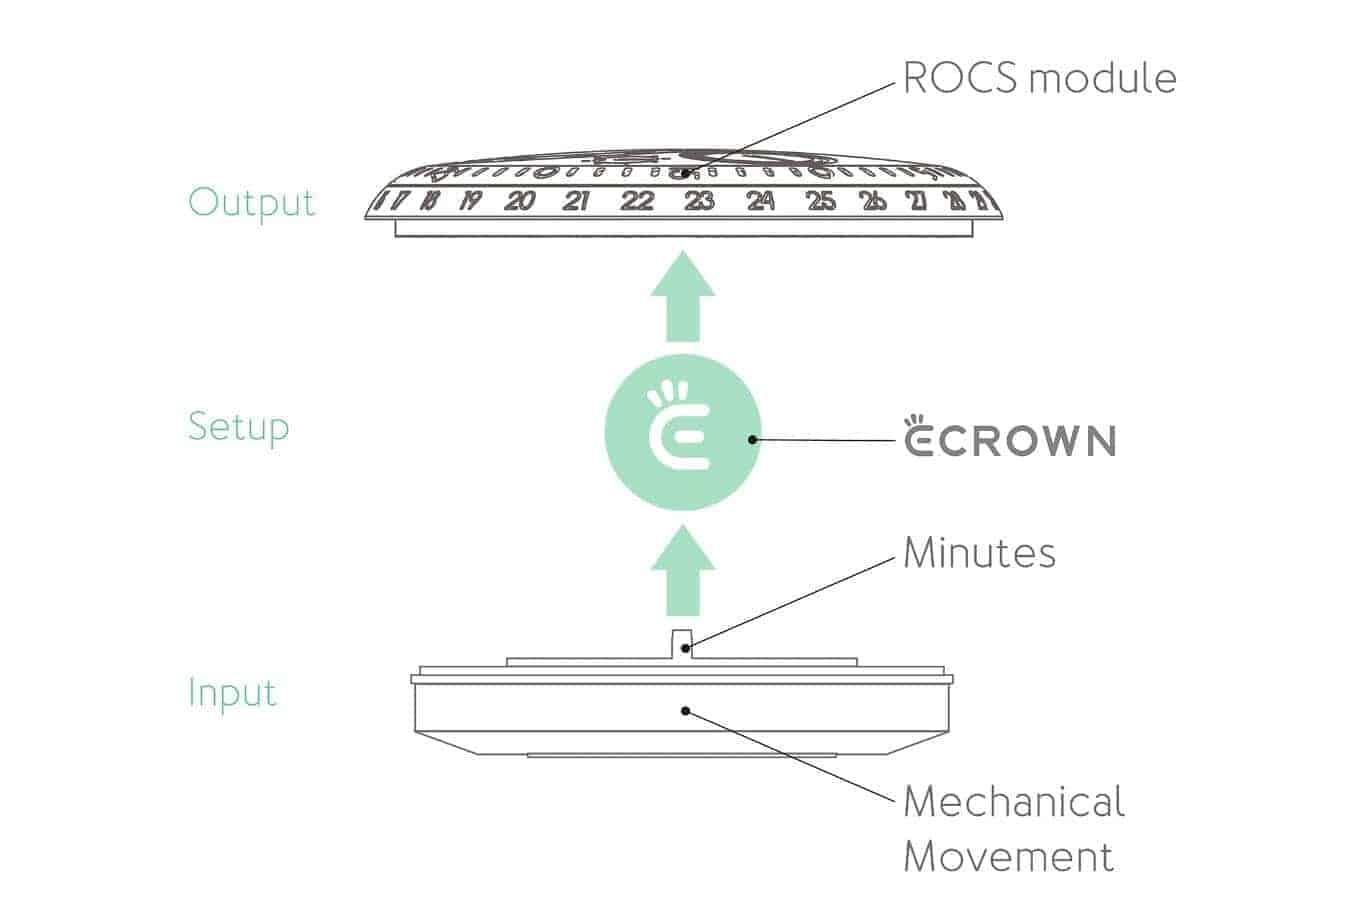 ressence Type 2 e Crown Concept smartwatch concept image 03